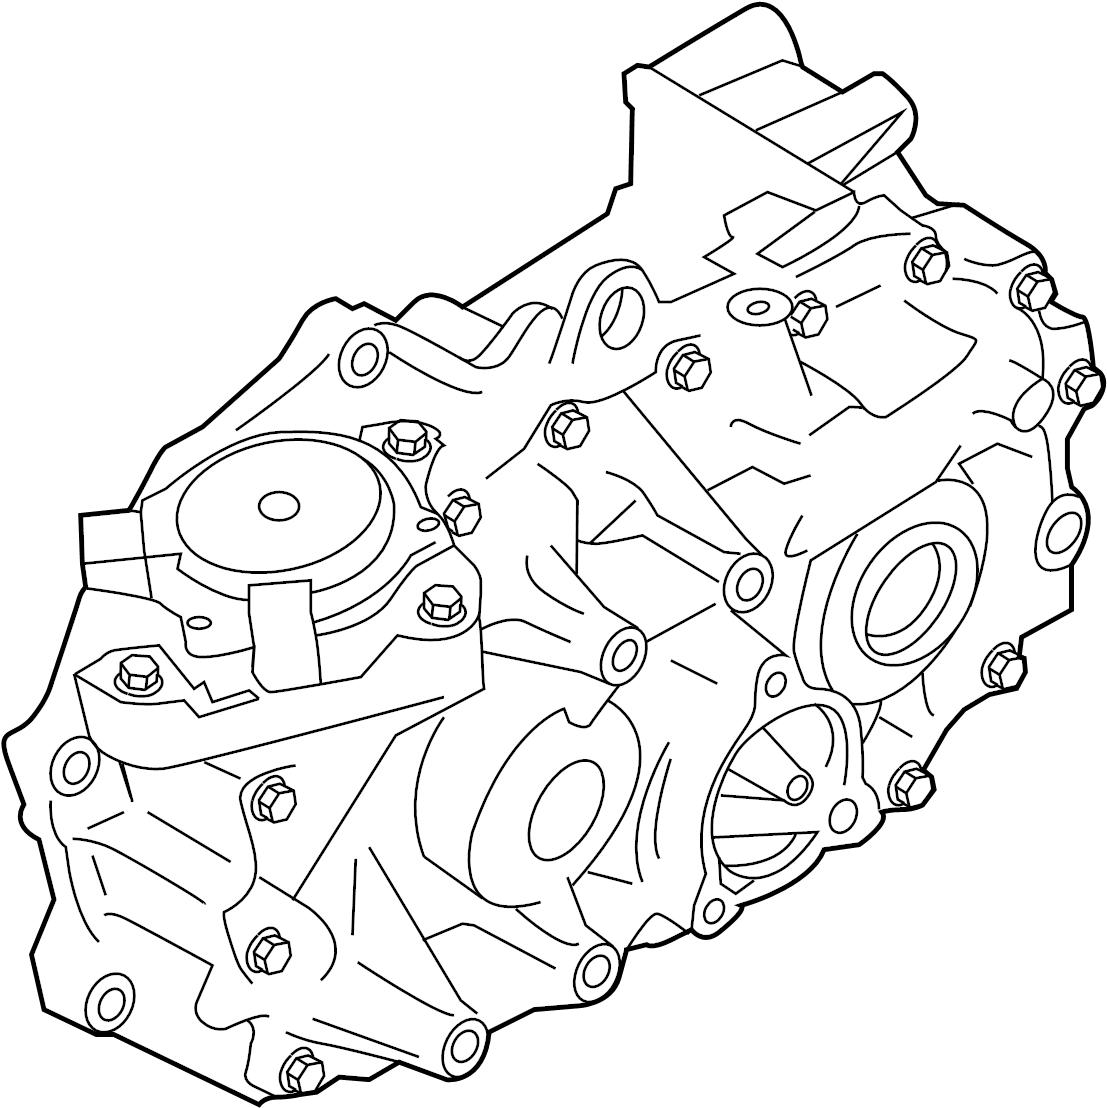 Nissan Leaf Automatic Transmission. GEAR, REDUCTION